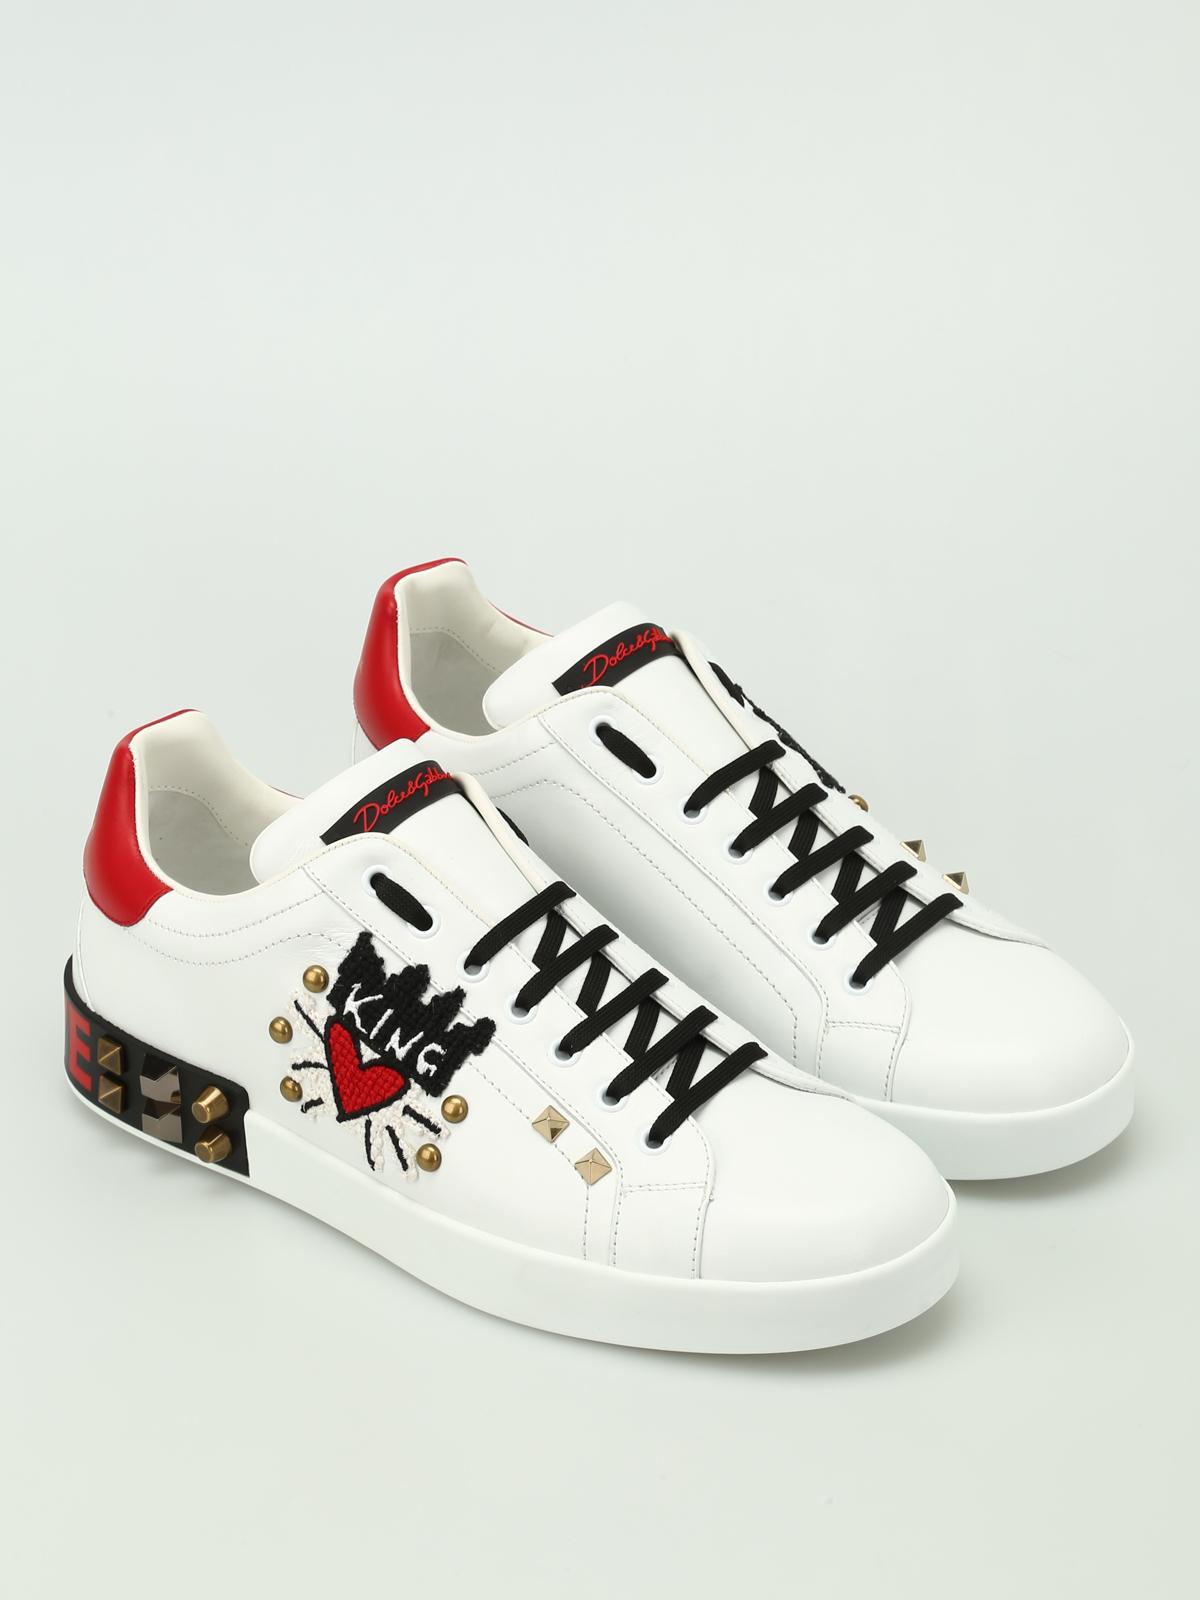 Gabbana - King of Love leather sneakers